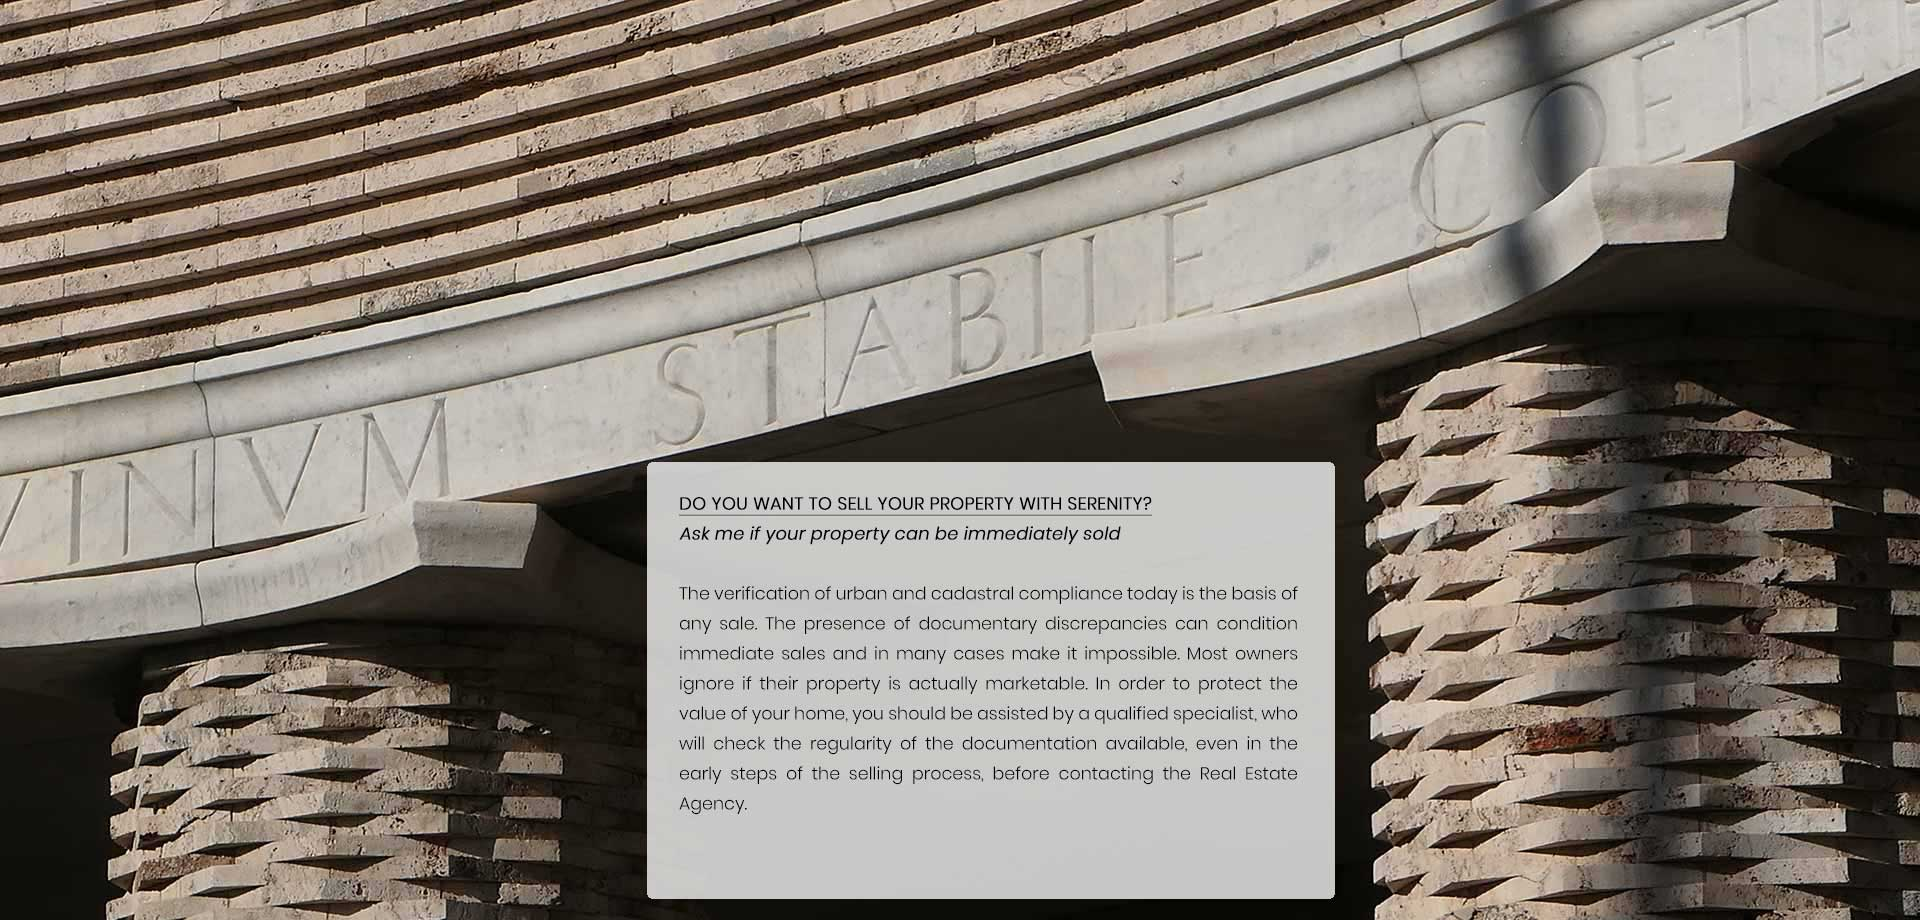 giorgio-rossetti-architect-claim-3